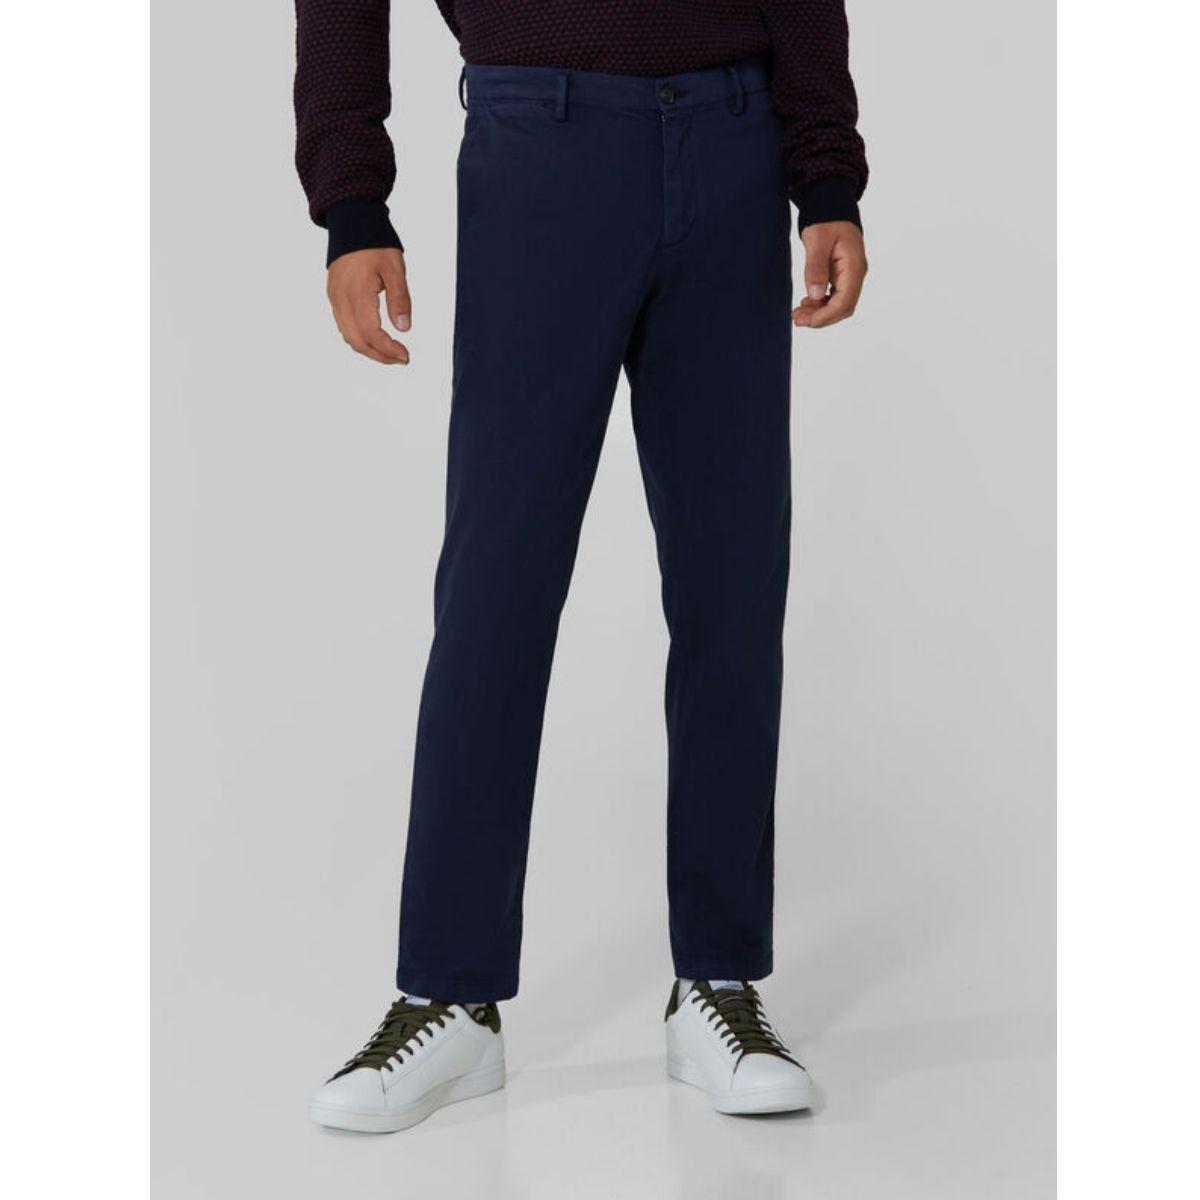 Pantalone Trussardi Aviator...